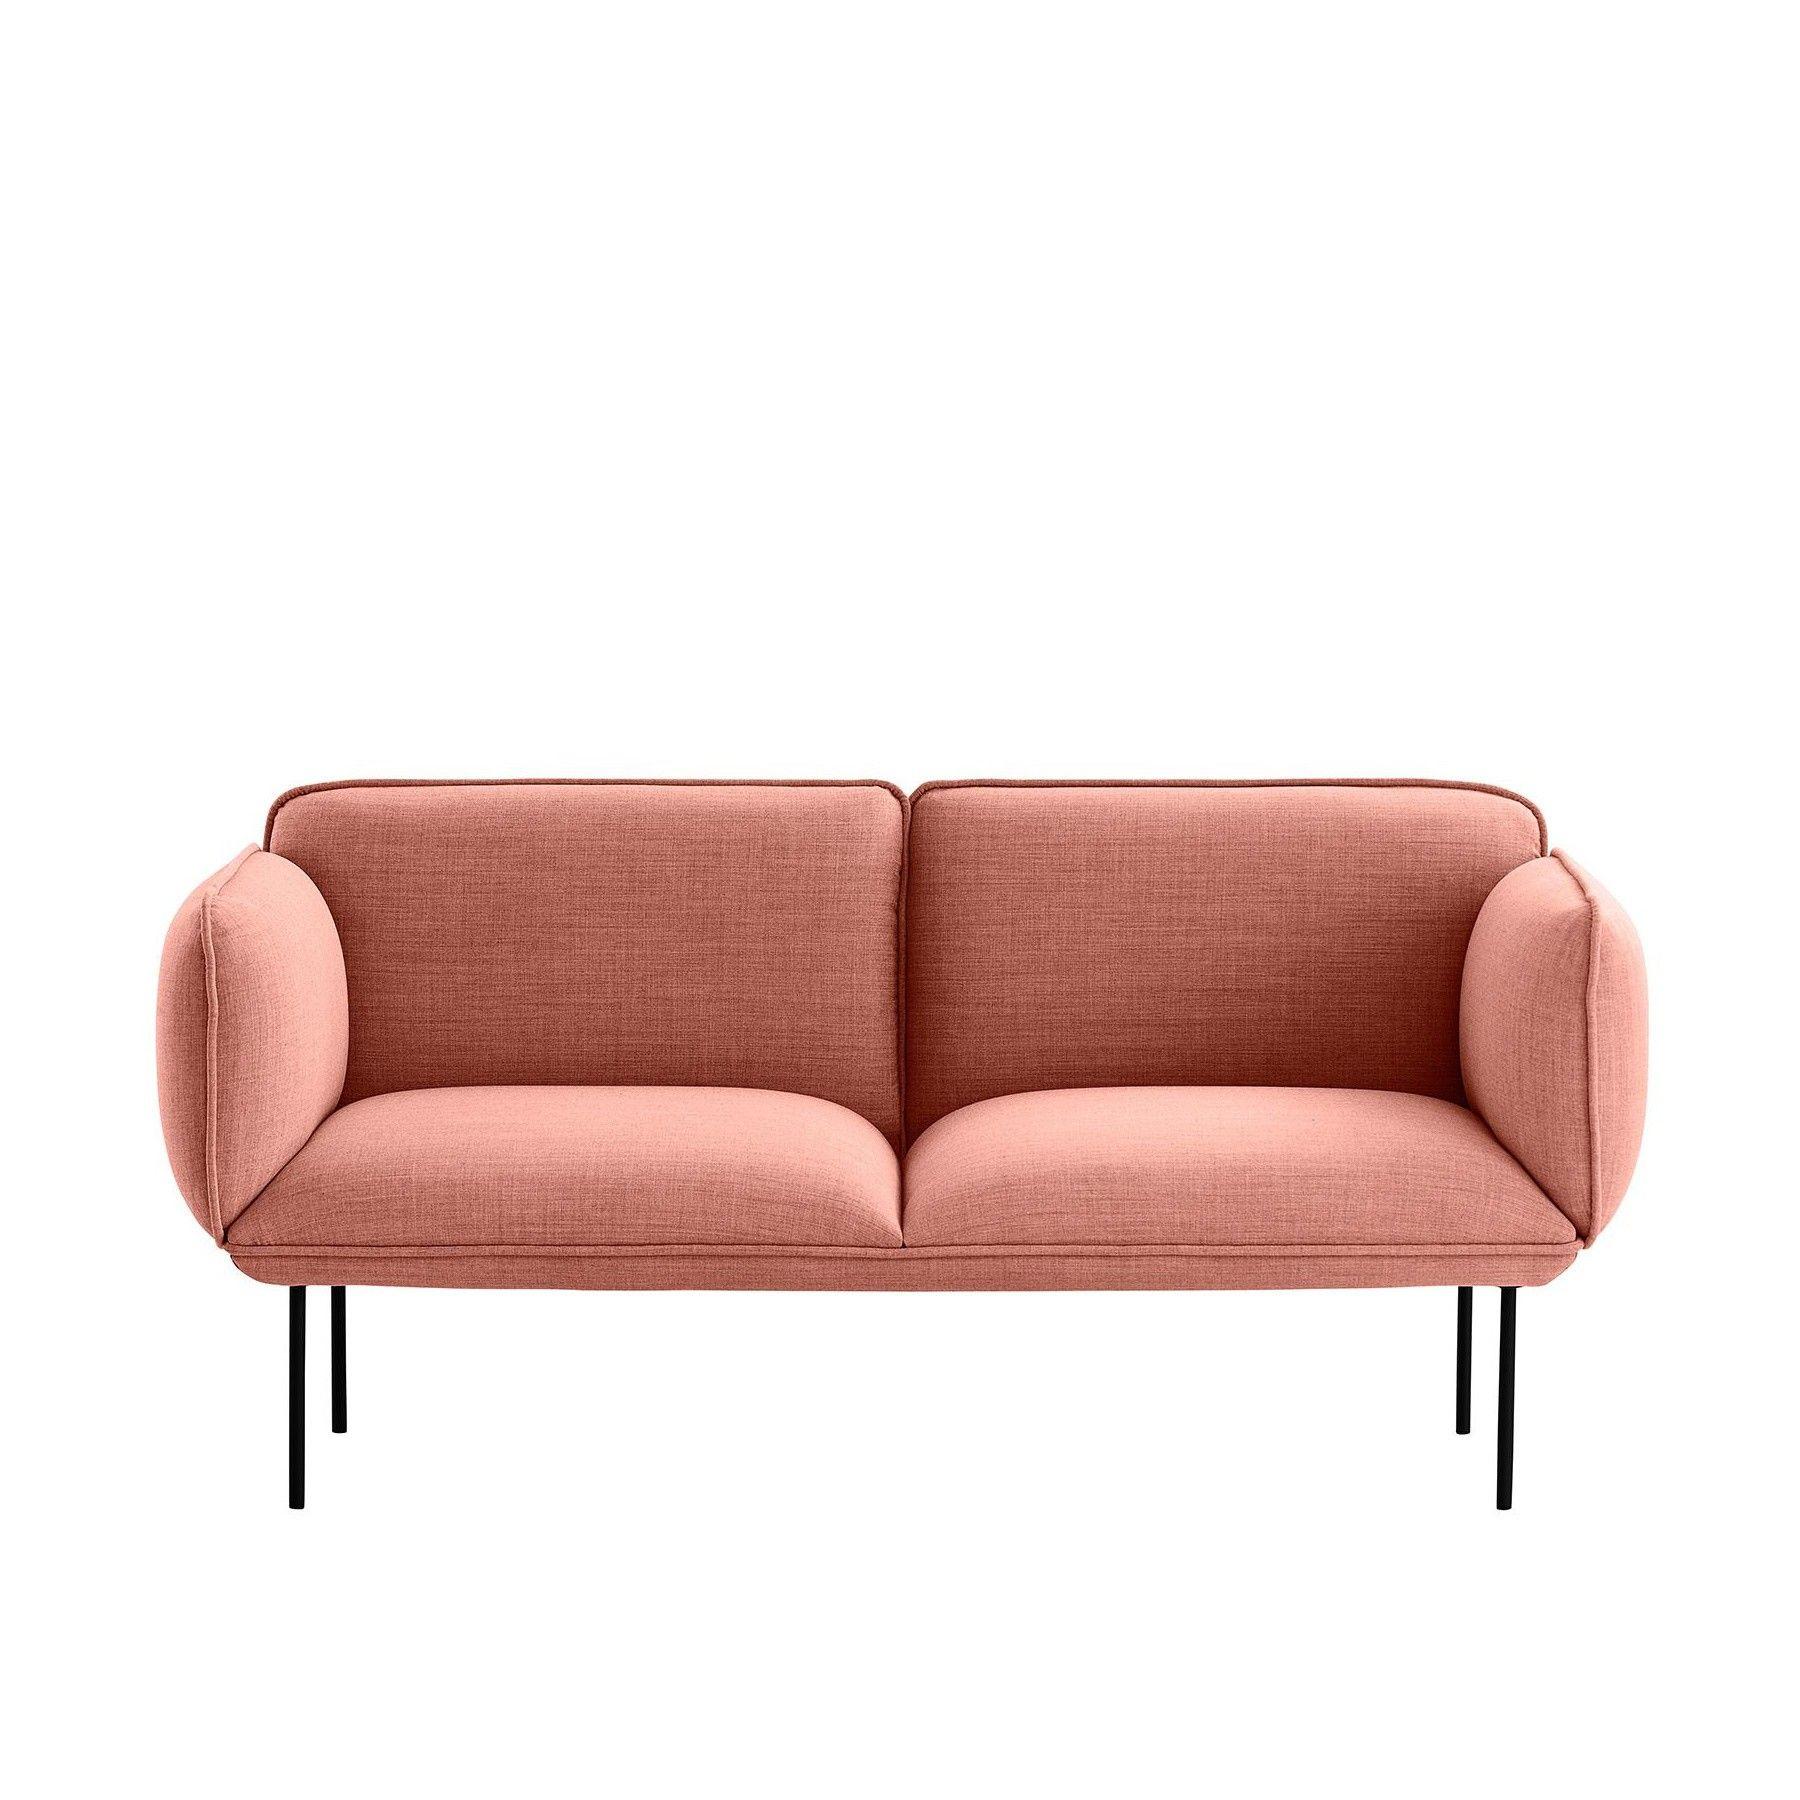 Nakki 2-Seater Fabric Sofa | Sofa stoff, Stoffsofa, Sofa